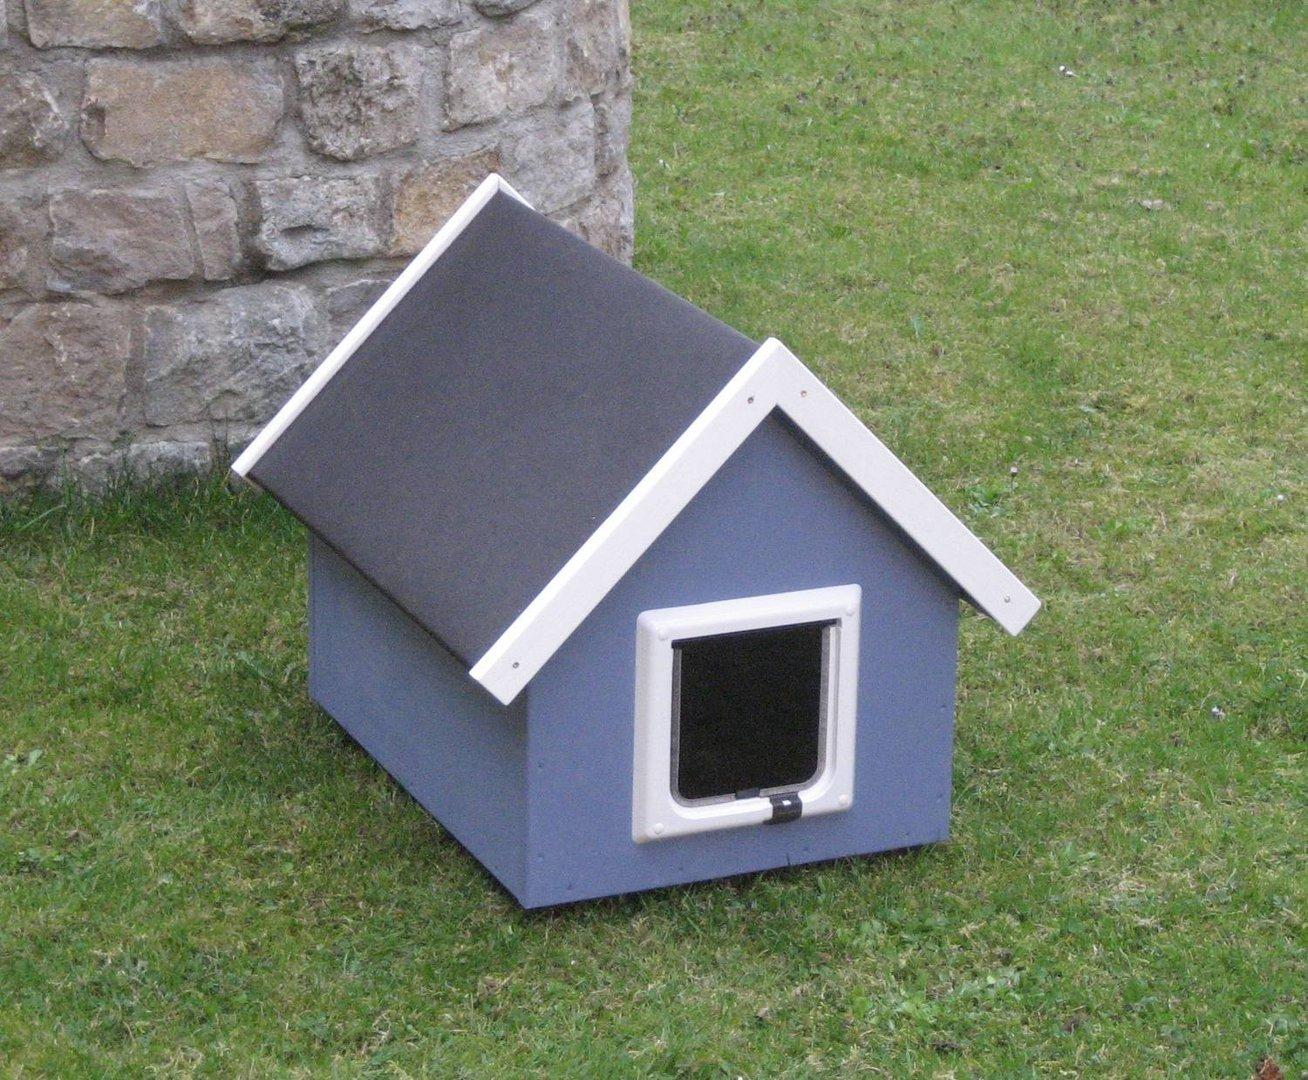 katzenhaus spitzdach farbe taubenblau katzenhaus wetterfest f r drau en. Black Bedroom Furniture Sets. Home Design Ideas